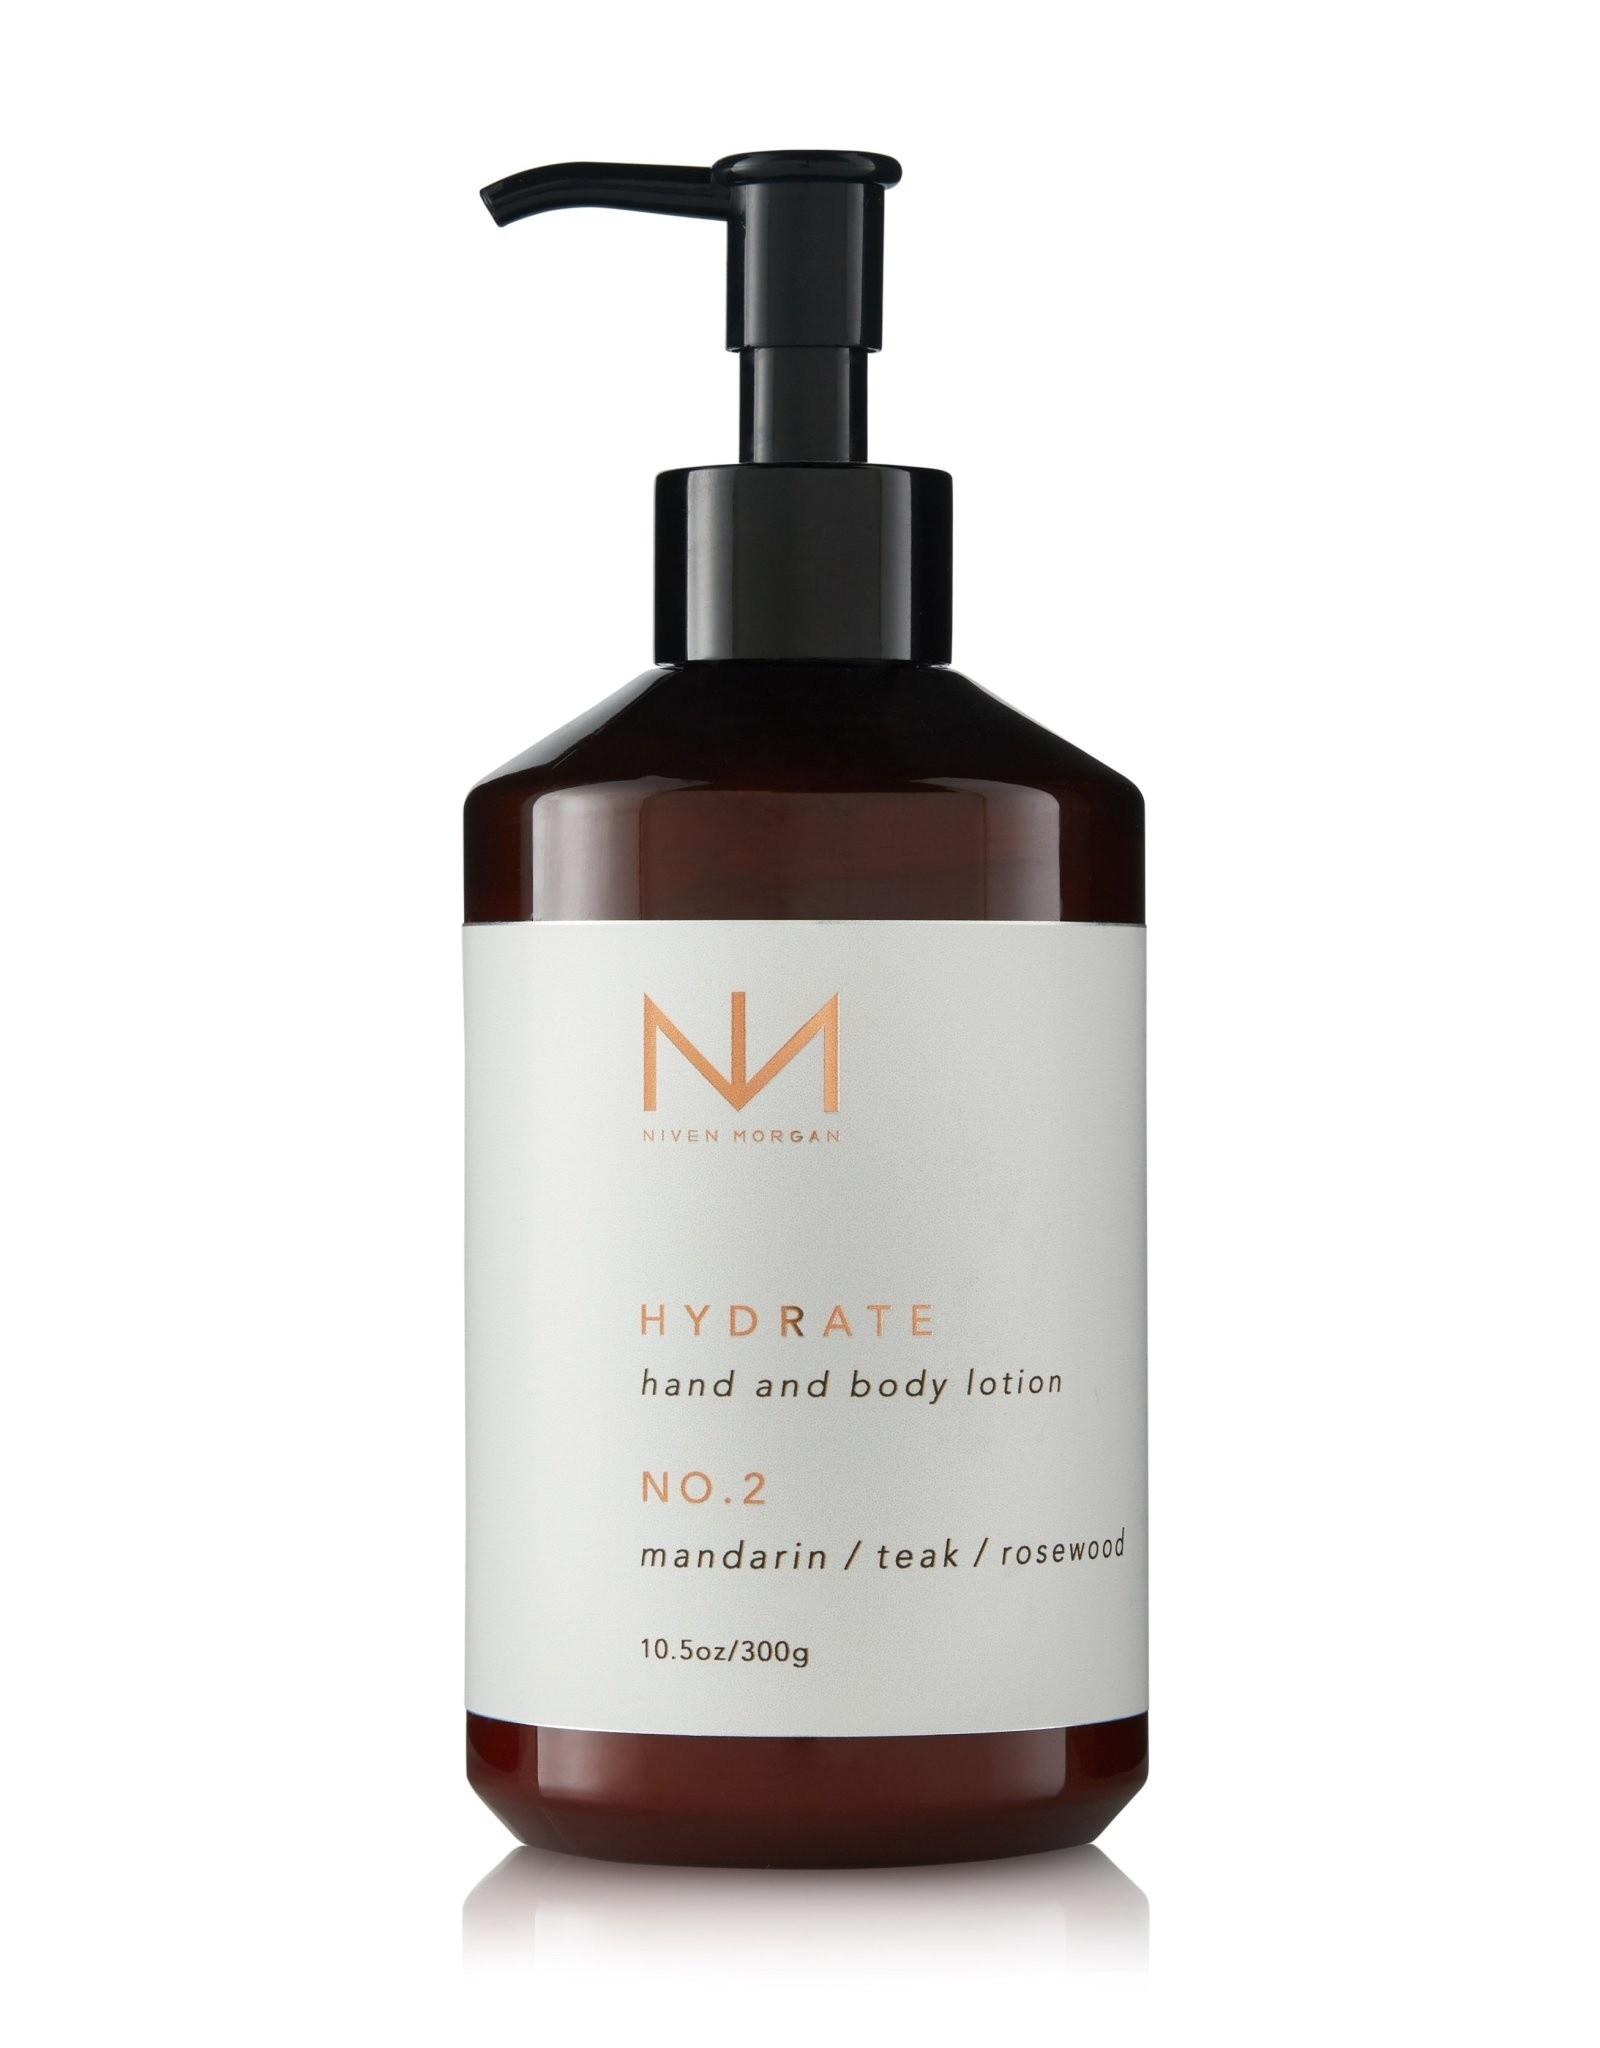 NM Hydrate Hand & Body No. 2